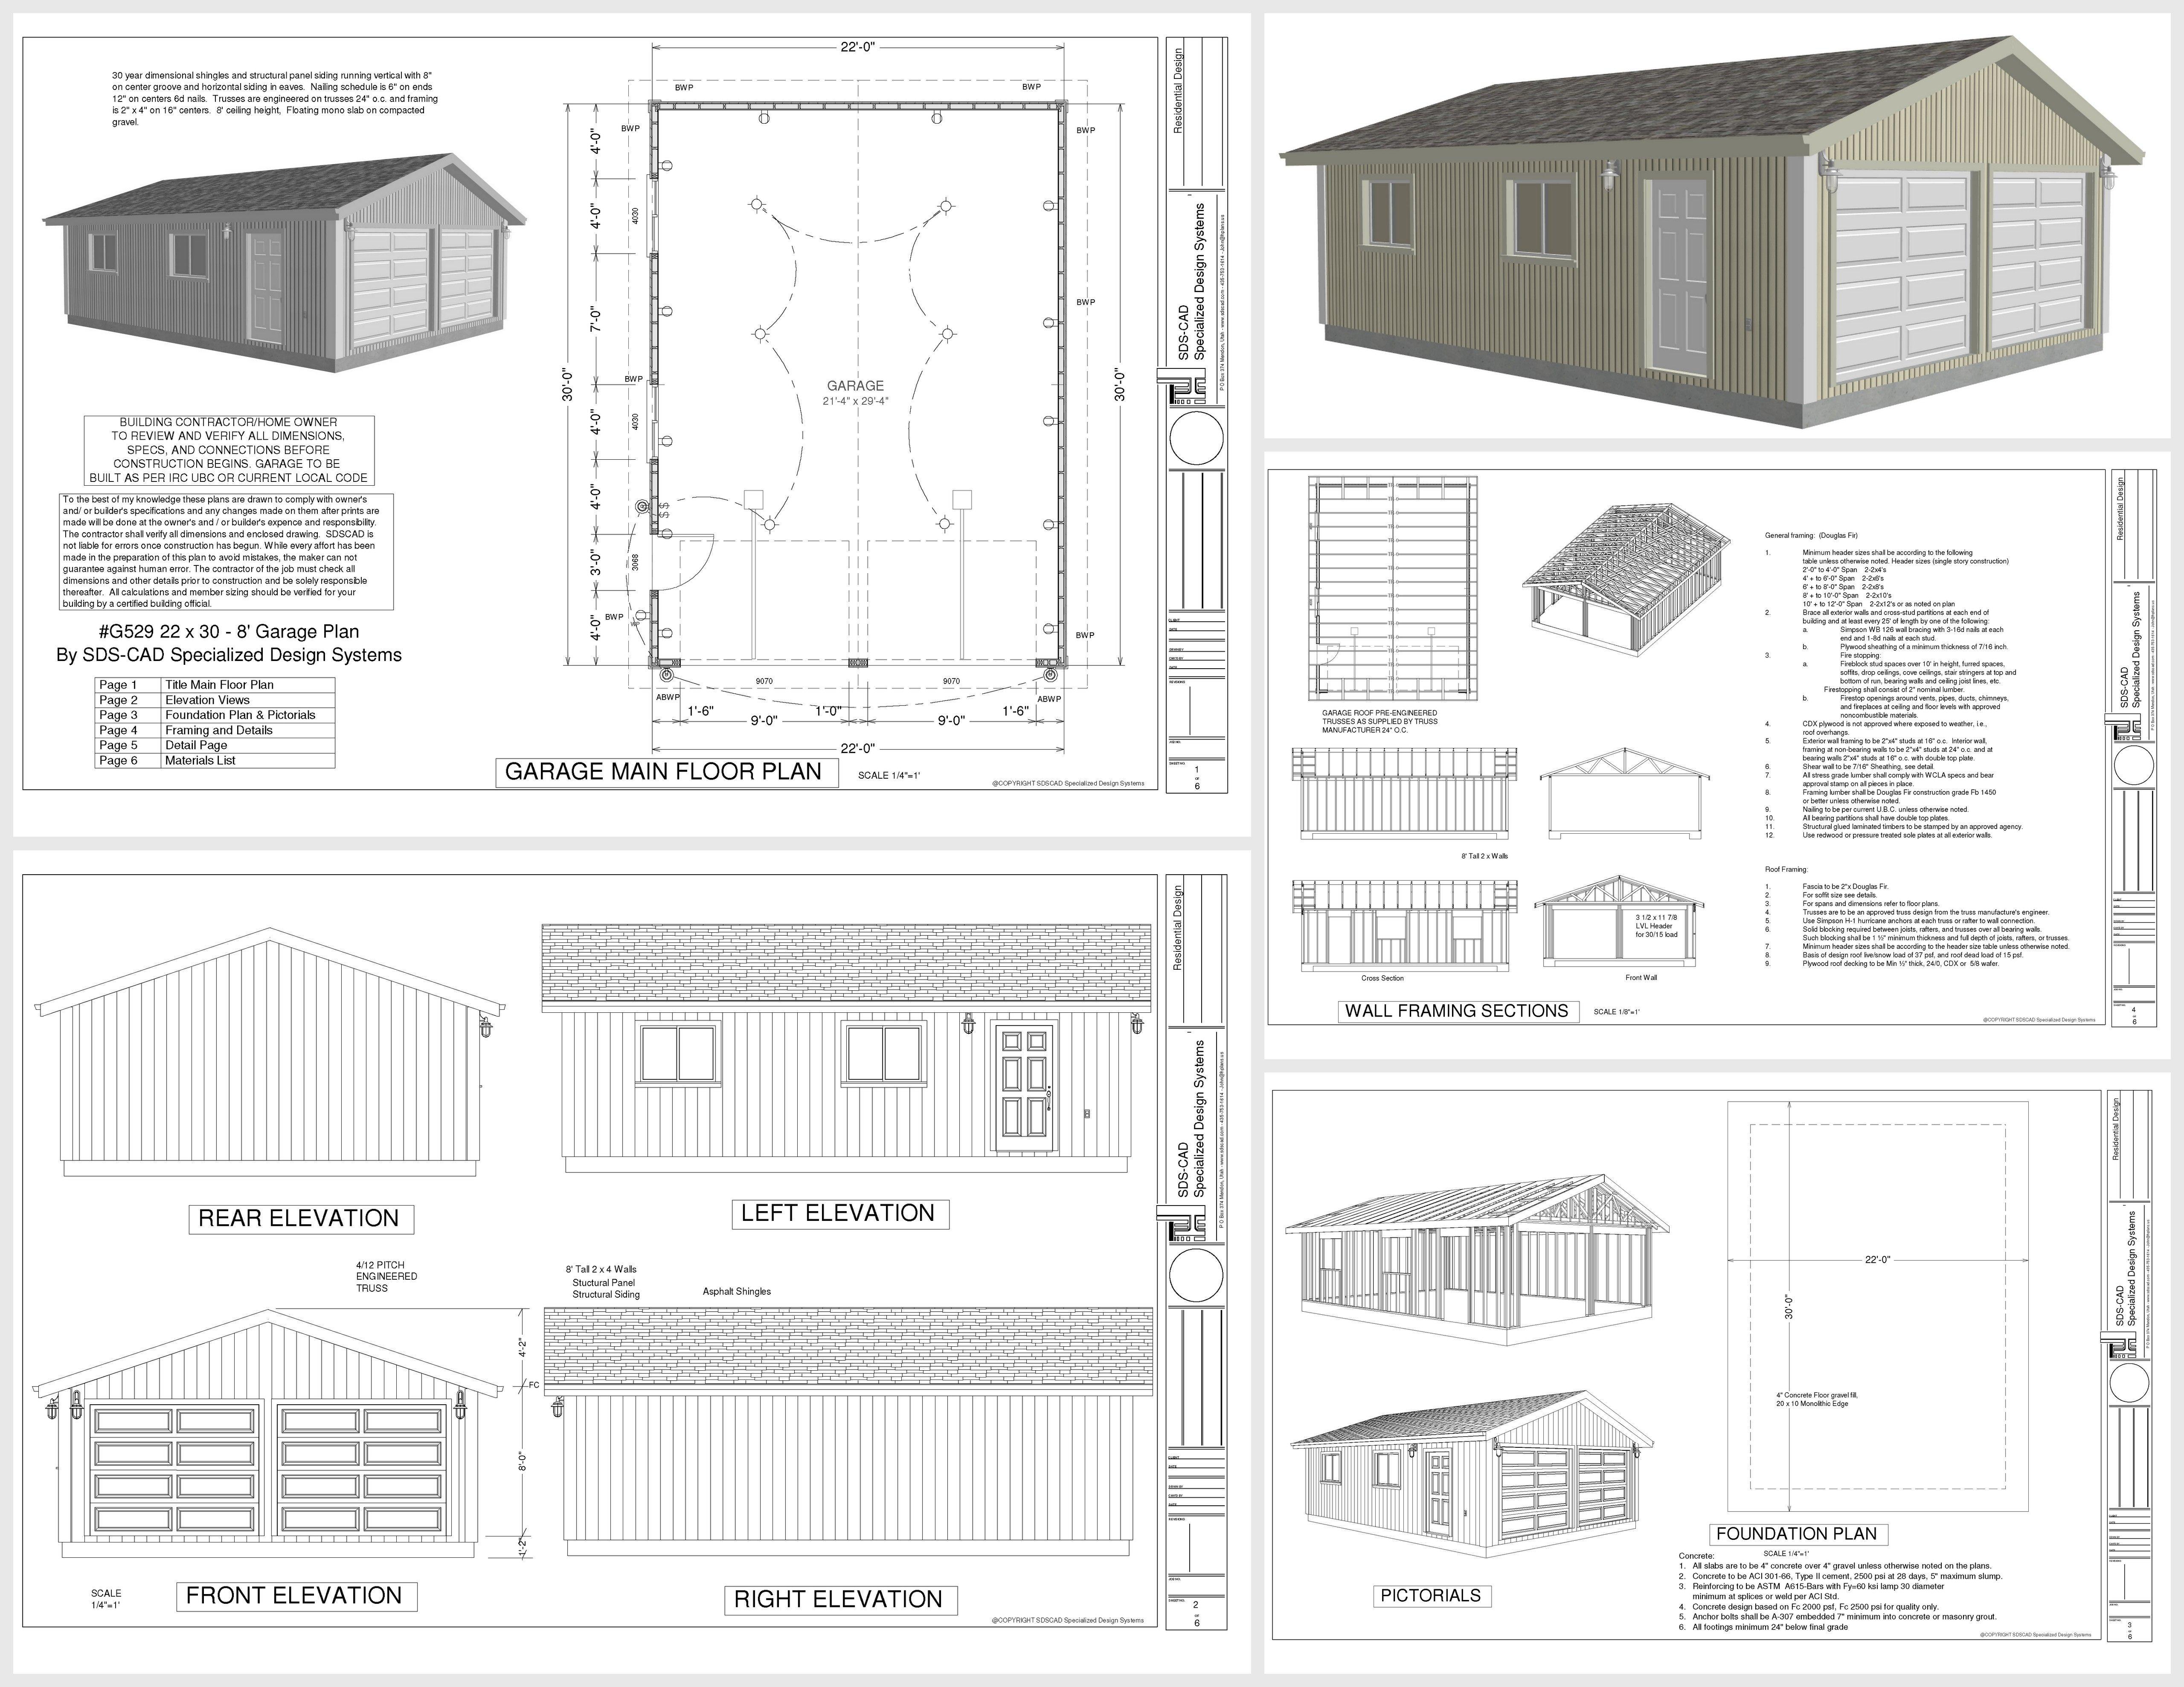 Pin By Max Adams On Madera In 2020 Garage Plans Free Garage Design Garage Plans